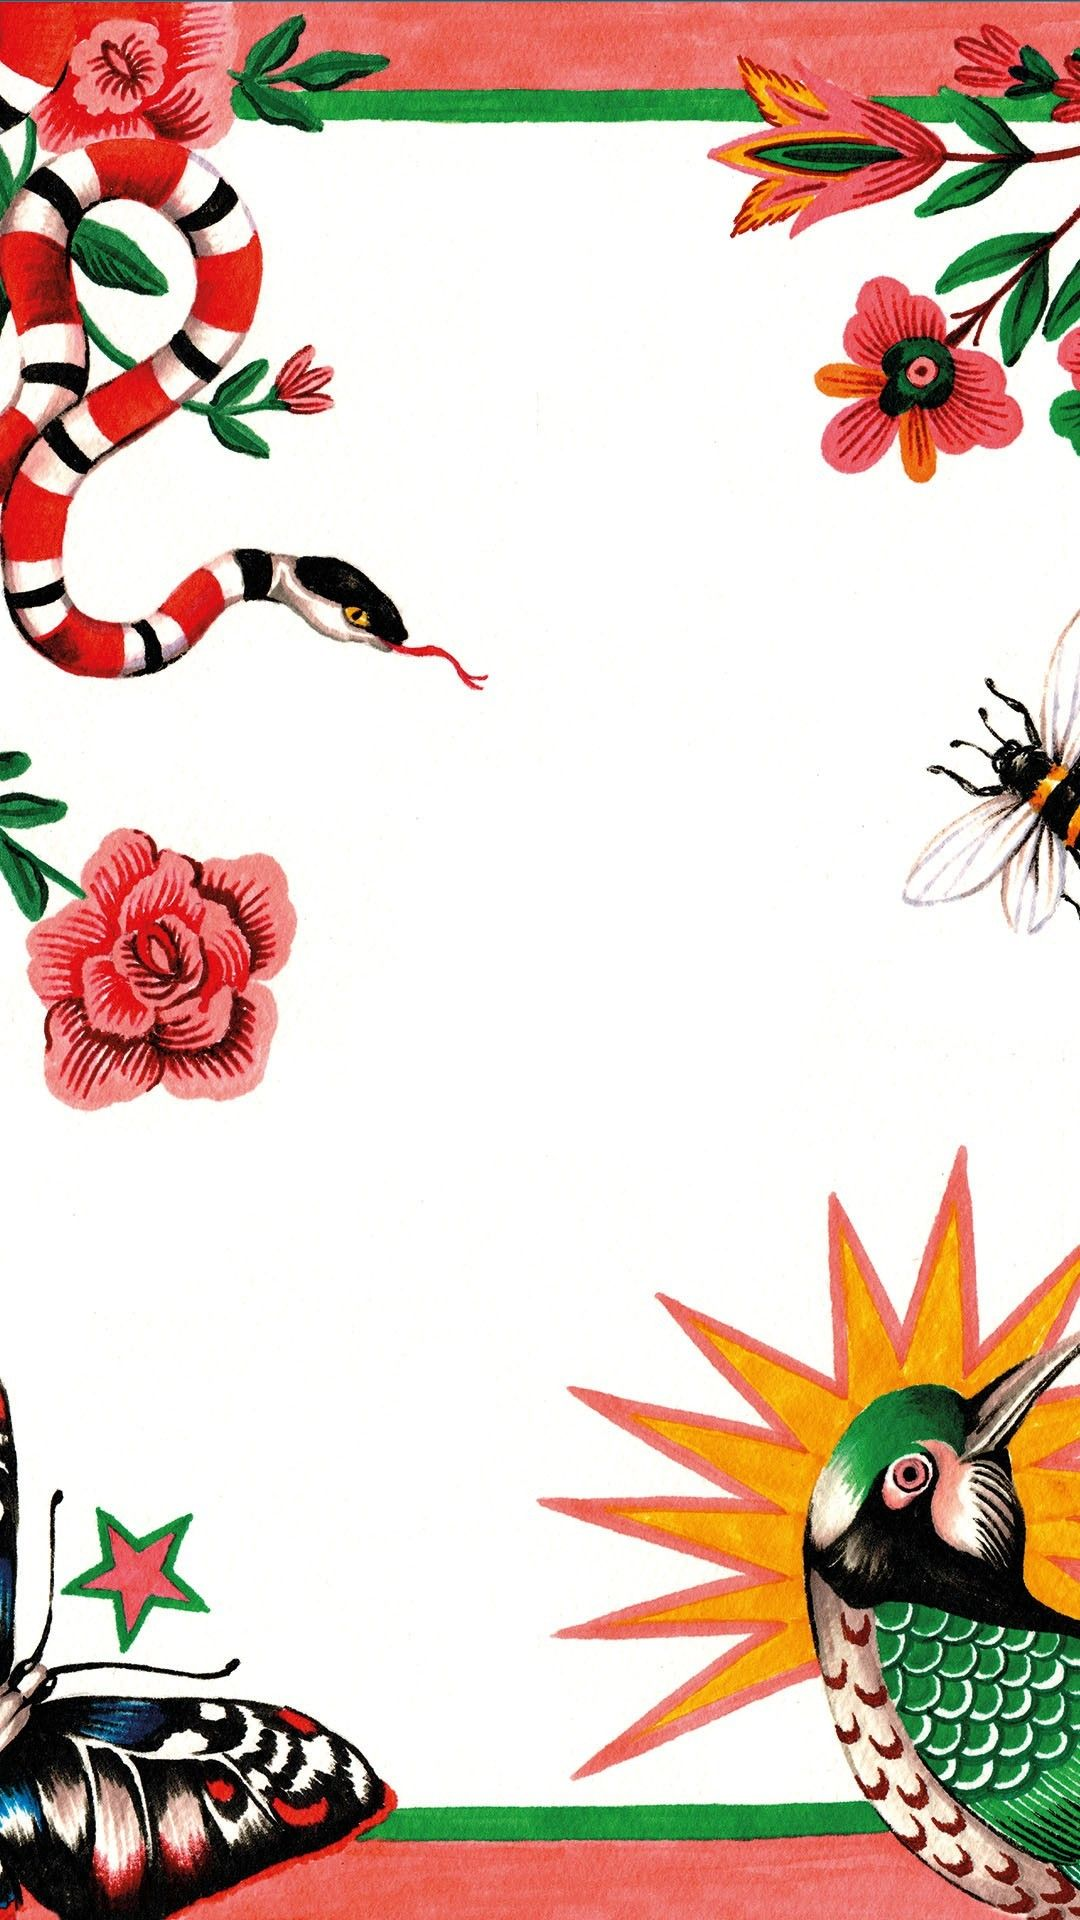 Art에 있는 자잉님의 핀 | Gucci wallpaper iphone, Iphone wallpaper ...